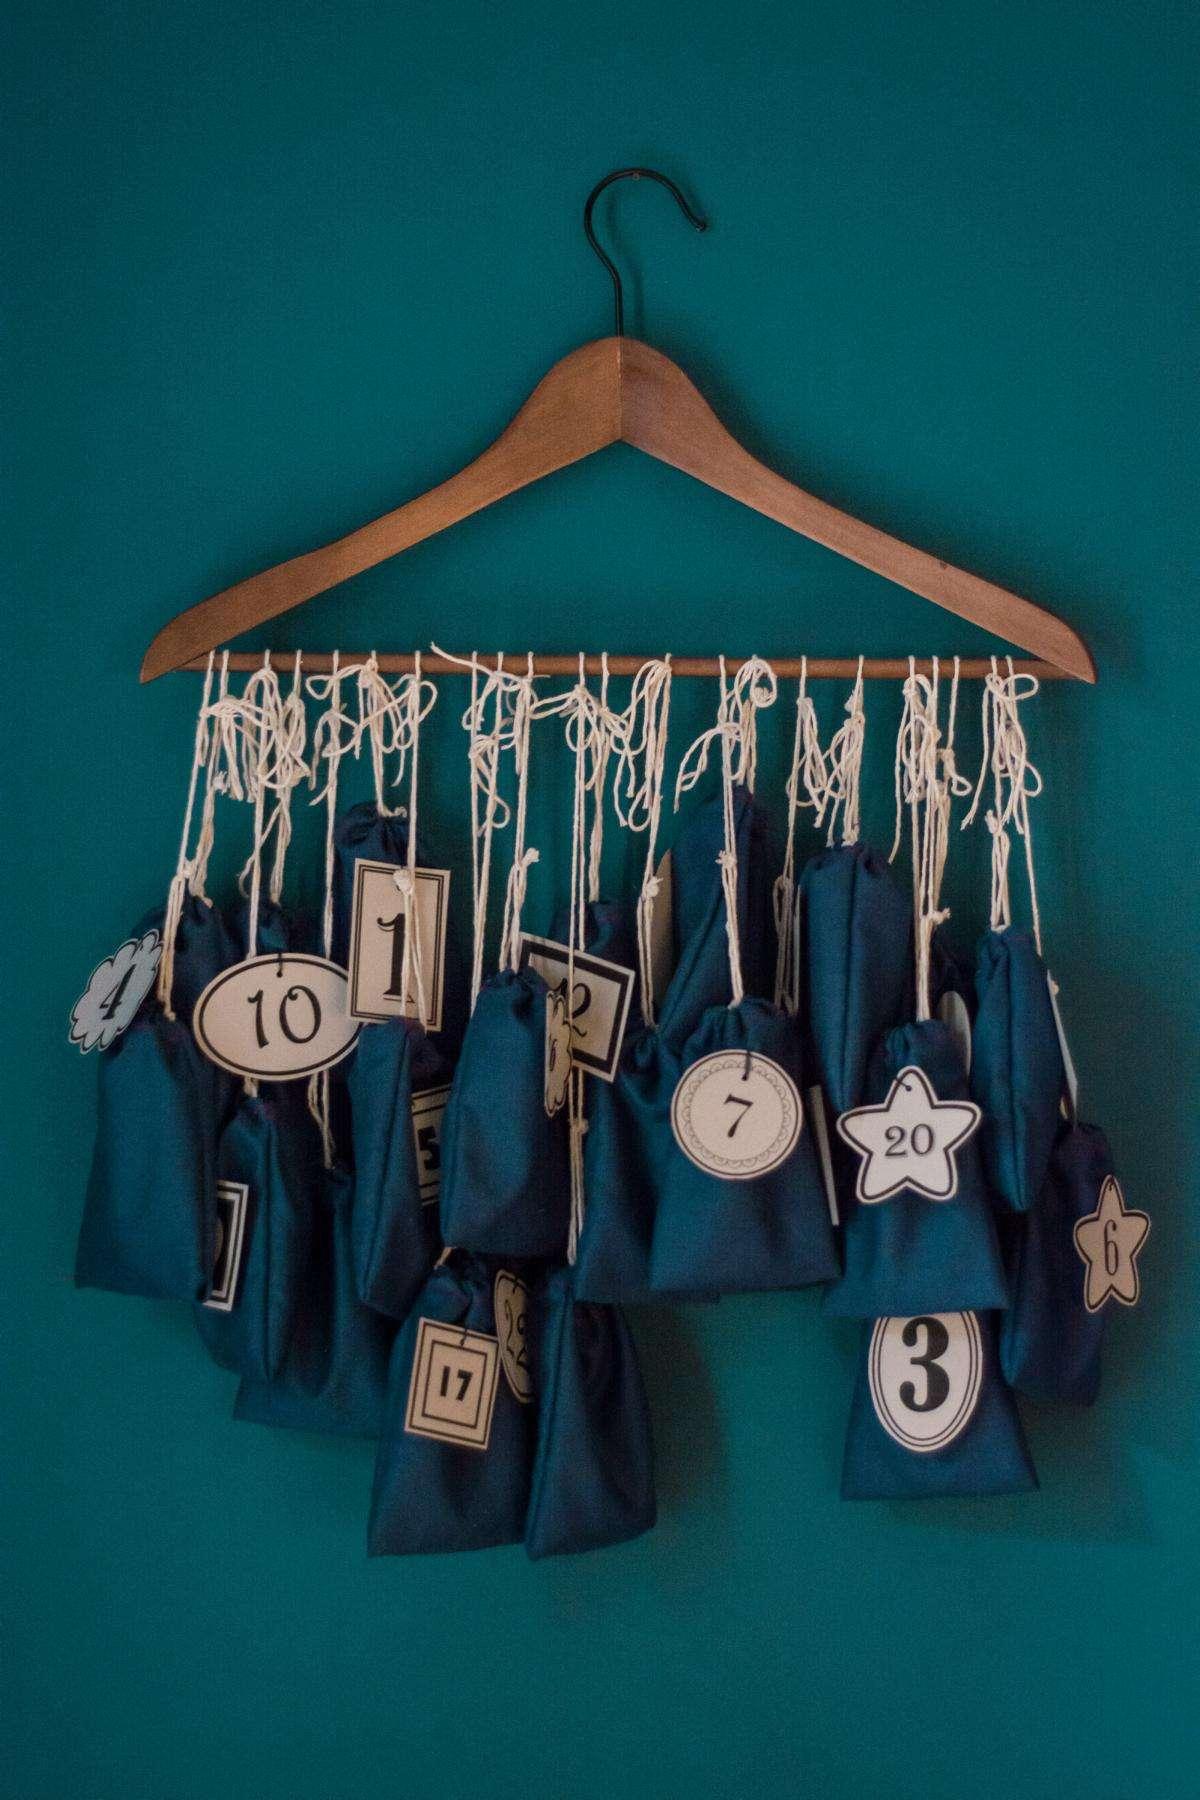 Calendario de Adviento con perchas